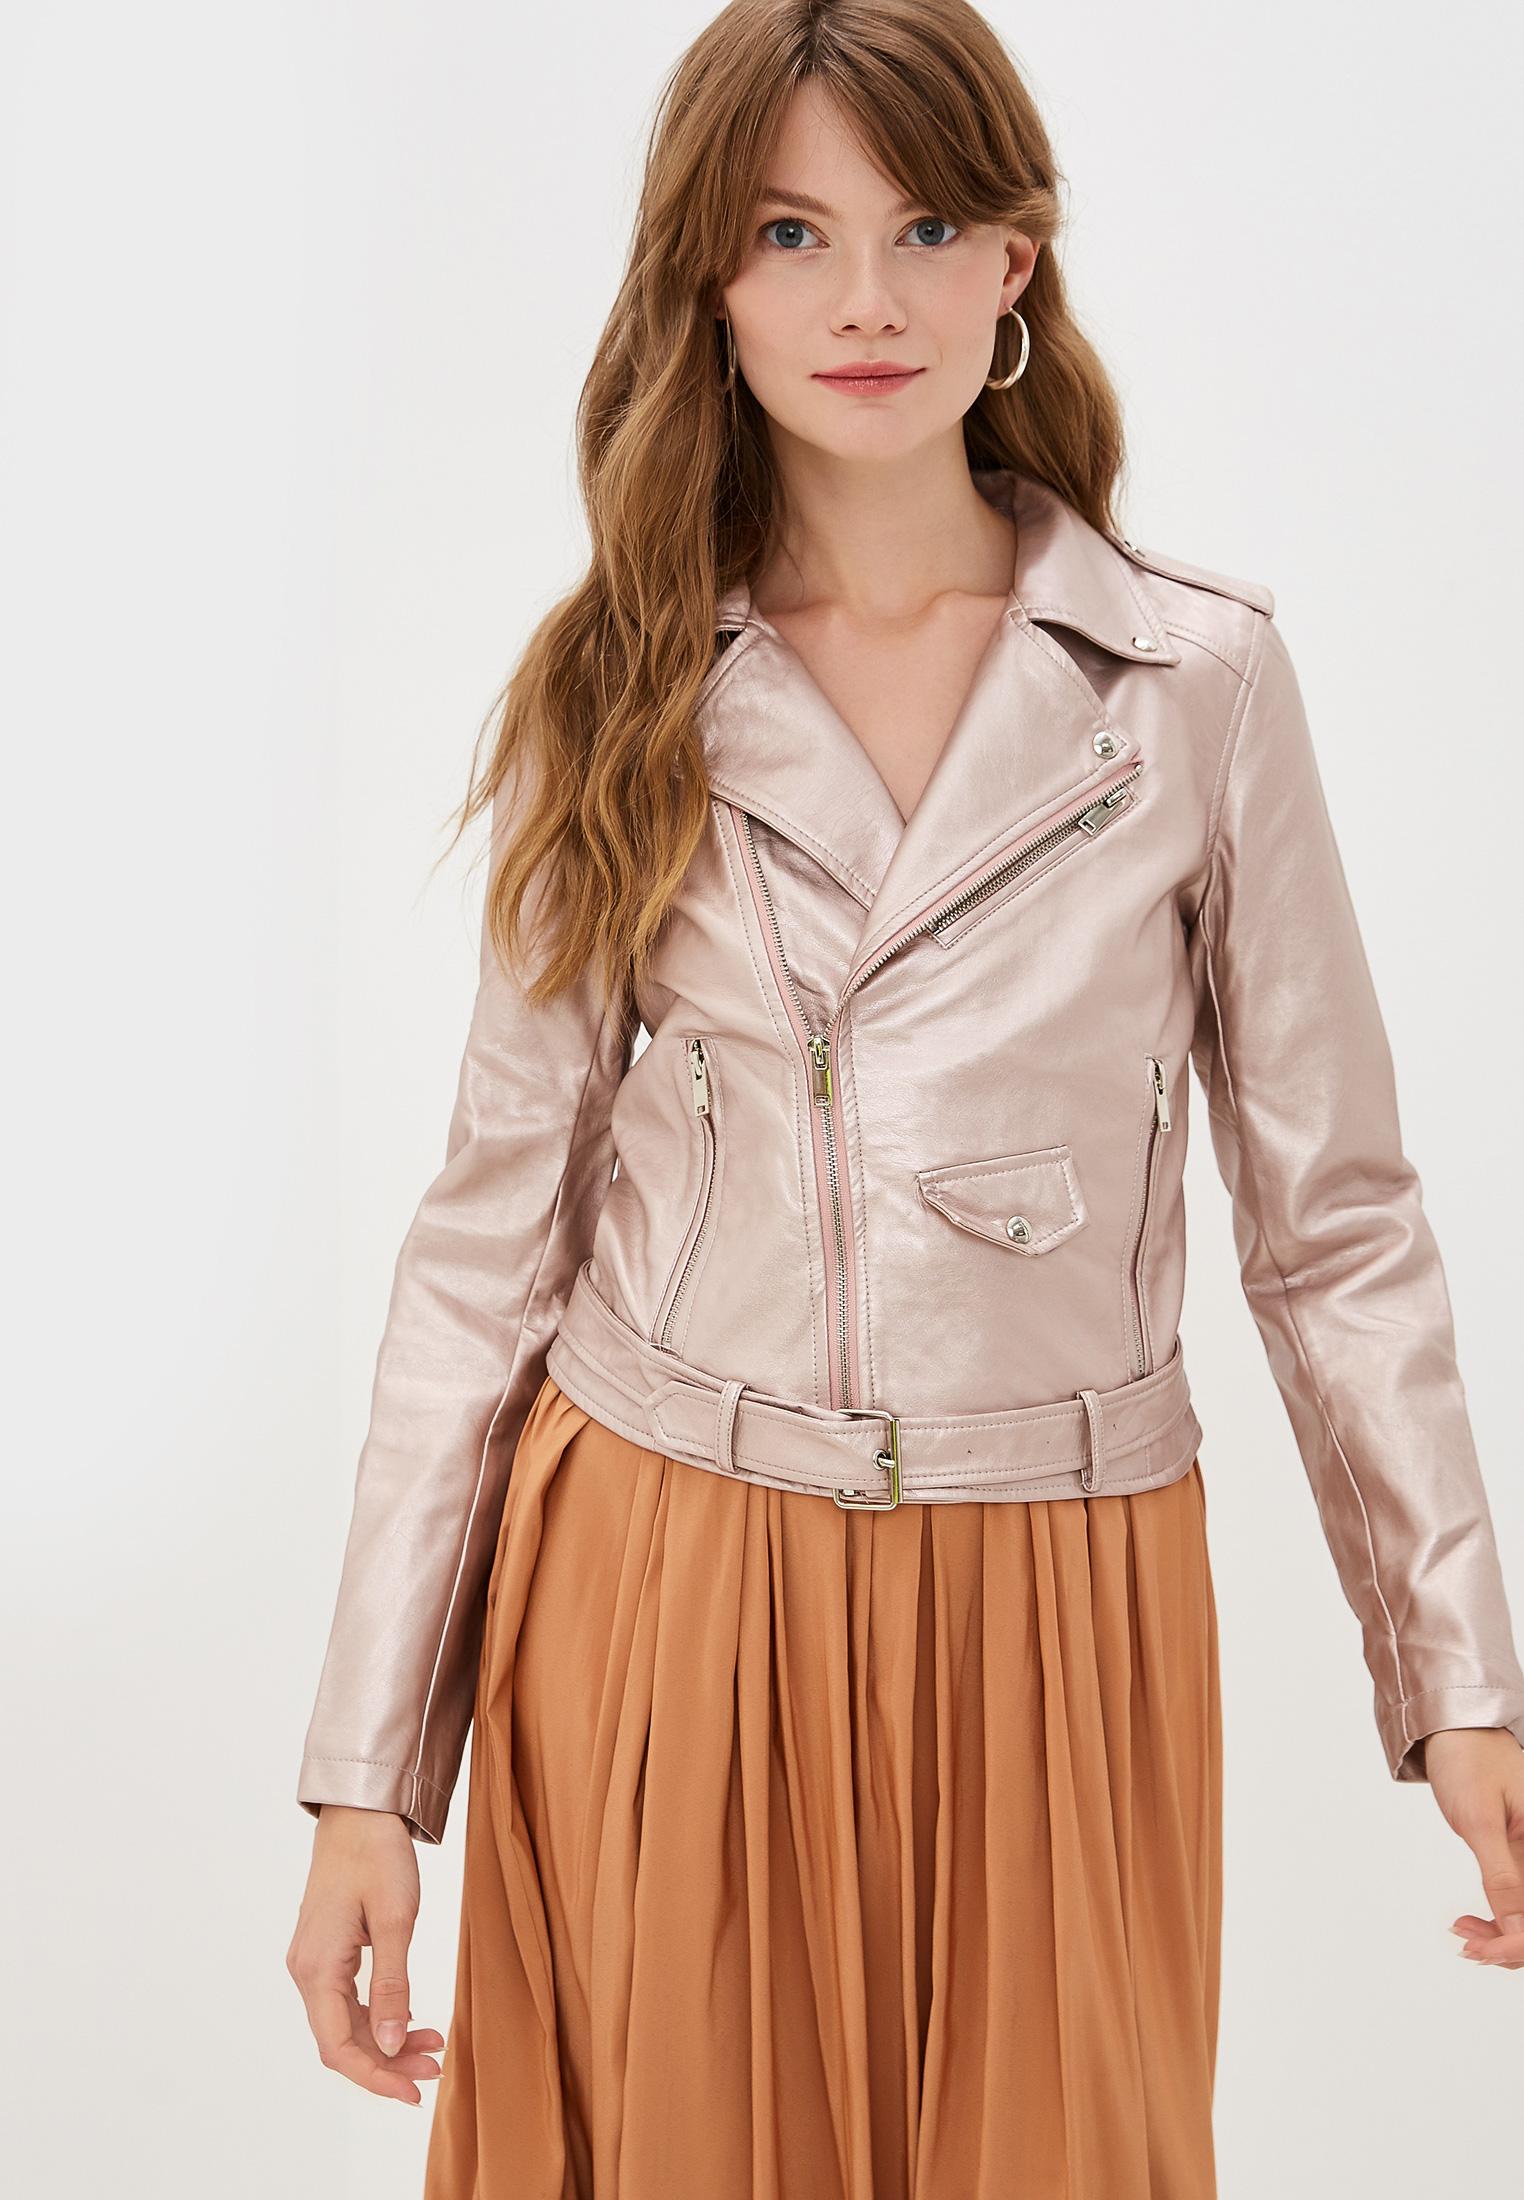 Кожаная куртка Moki 8994-1